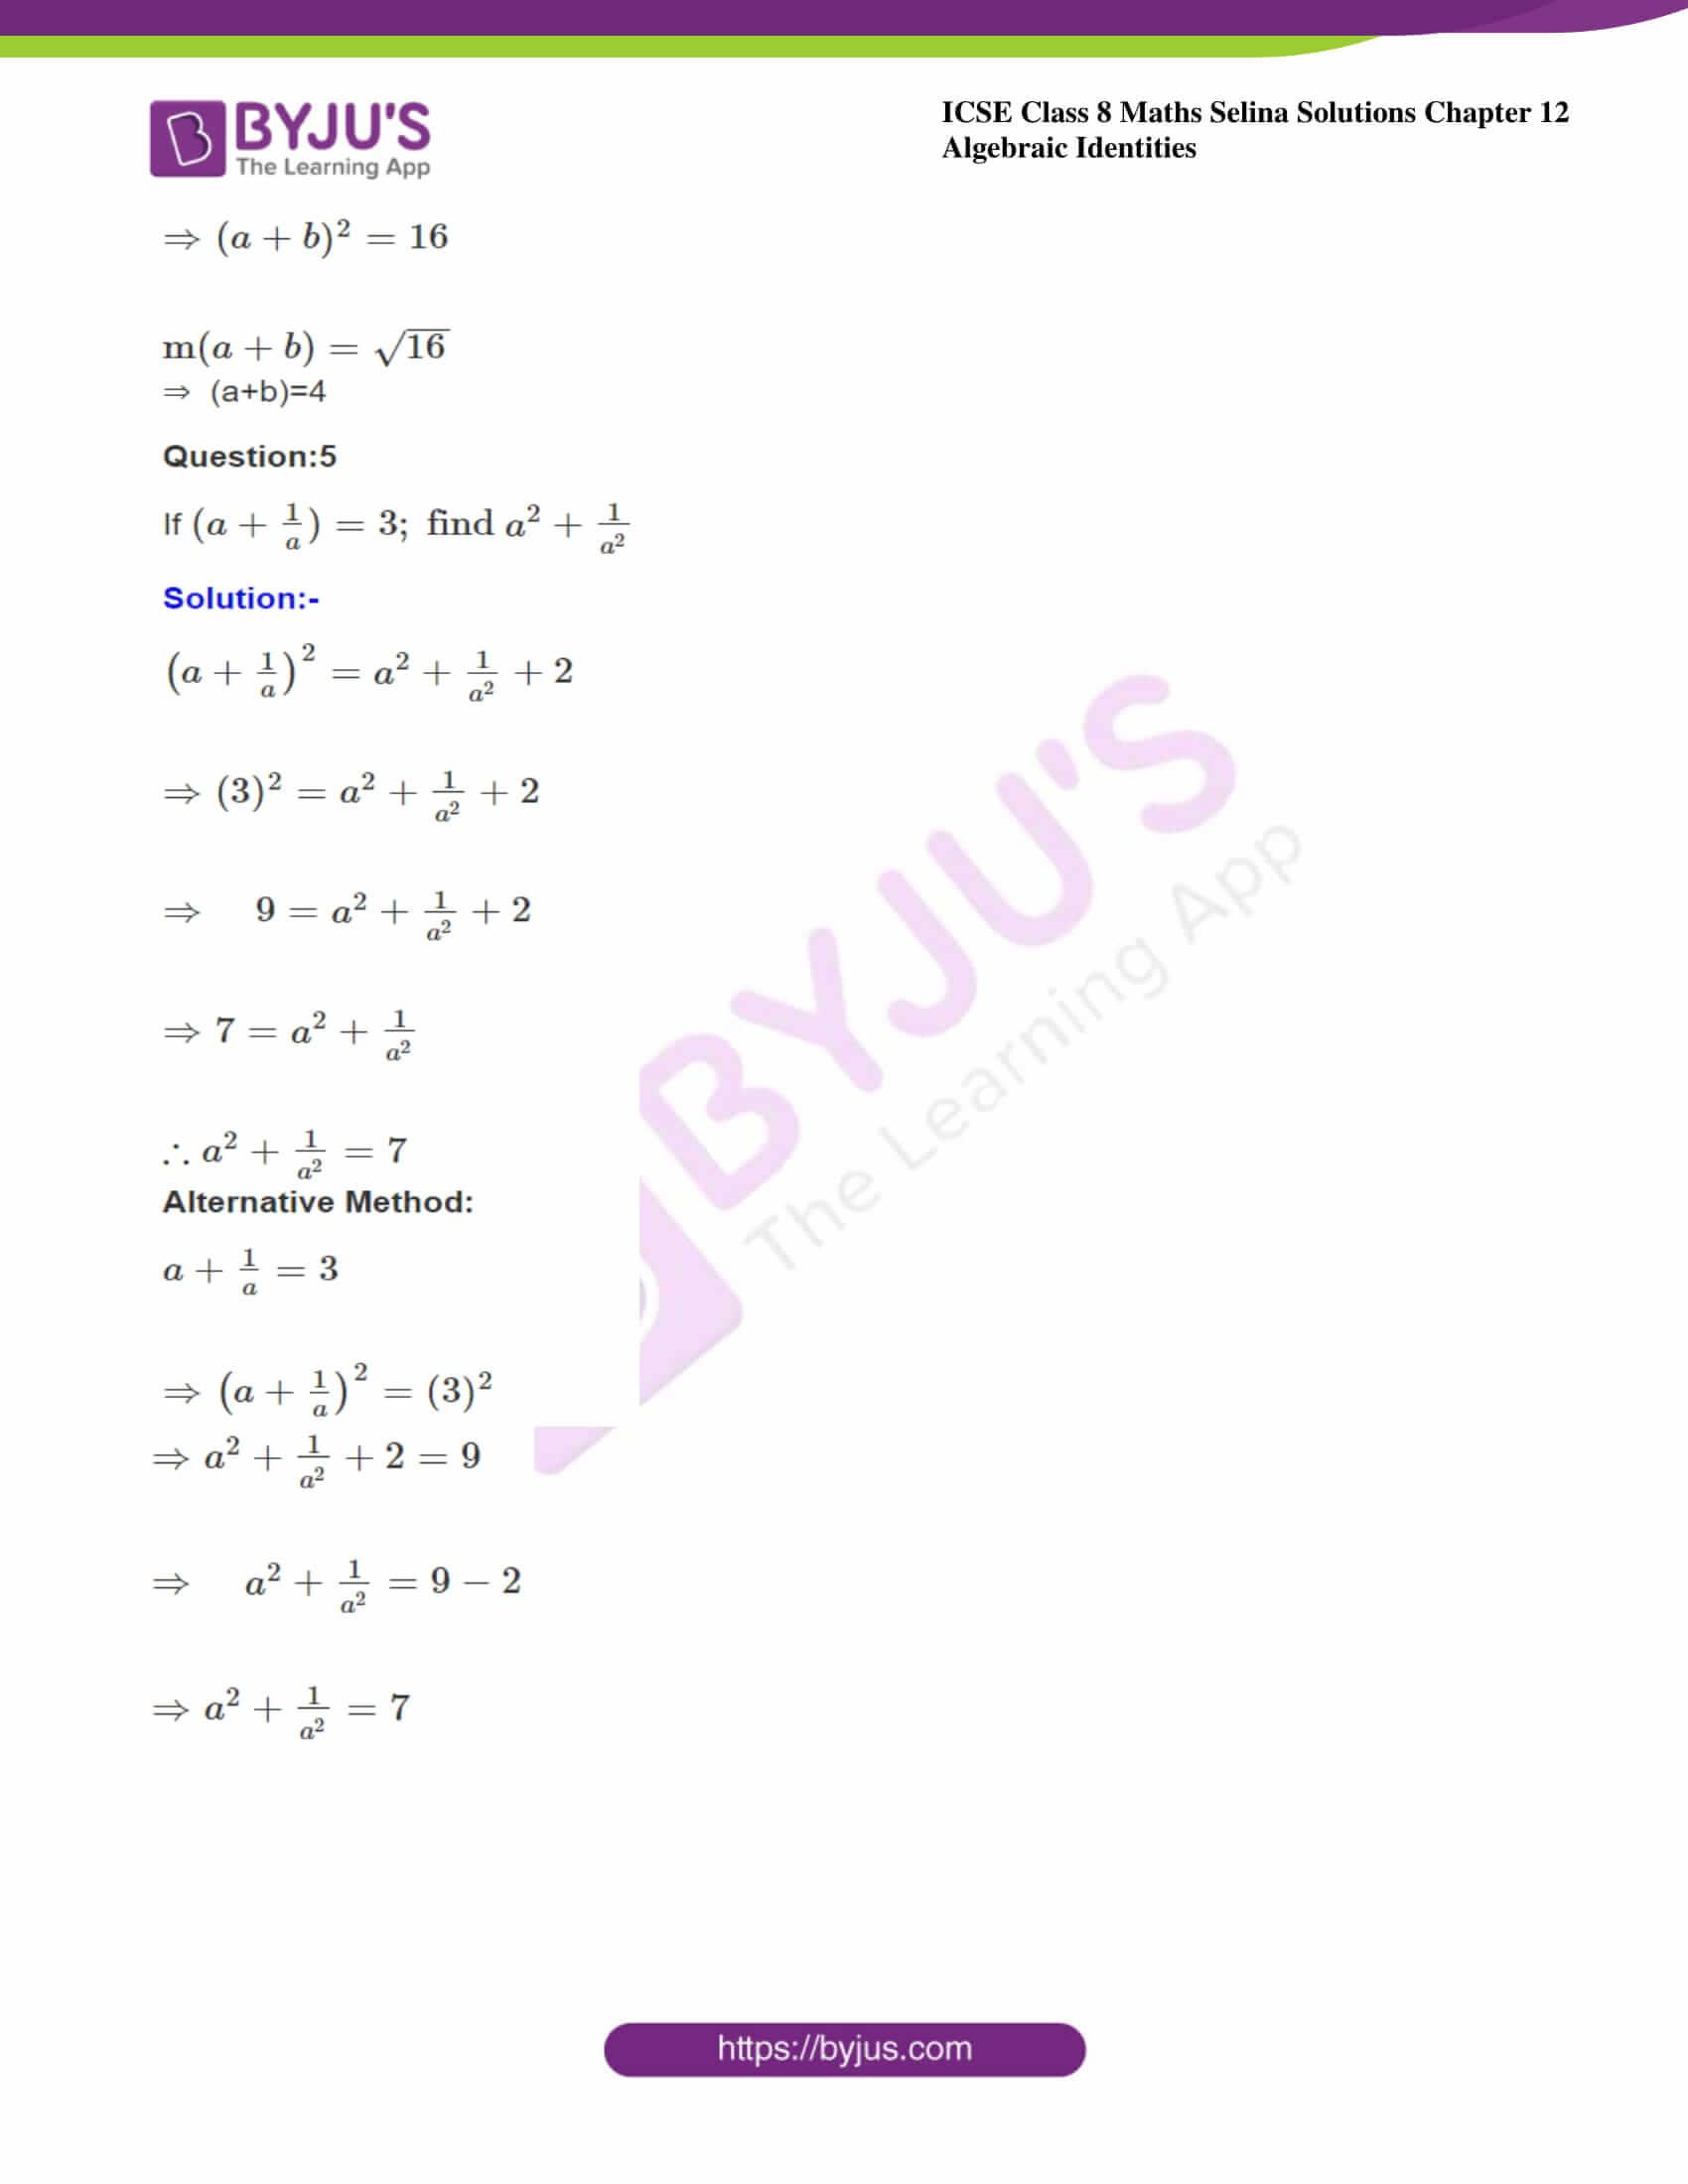 icse class 8 maths may3 selina solutions chapter 12 algebraic identities 13